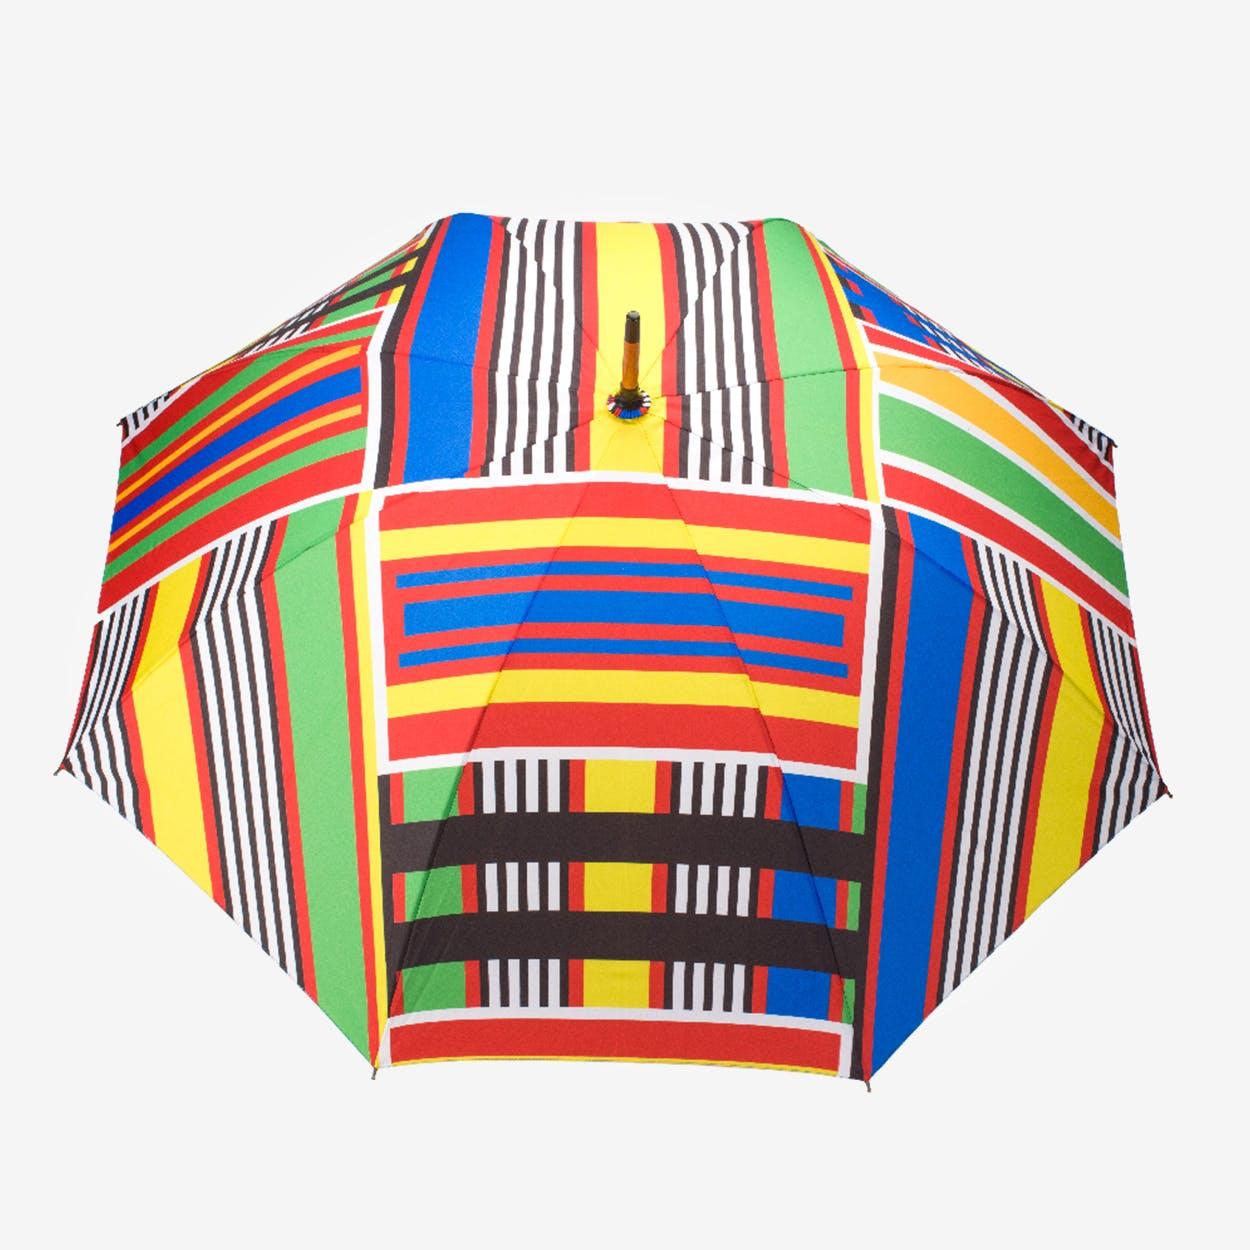 Windproof Auto Open Large Umbrella in Vintage Kente